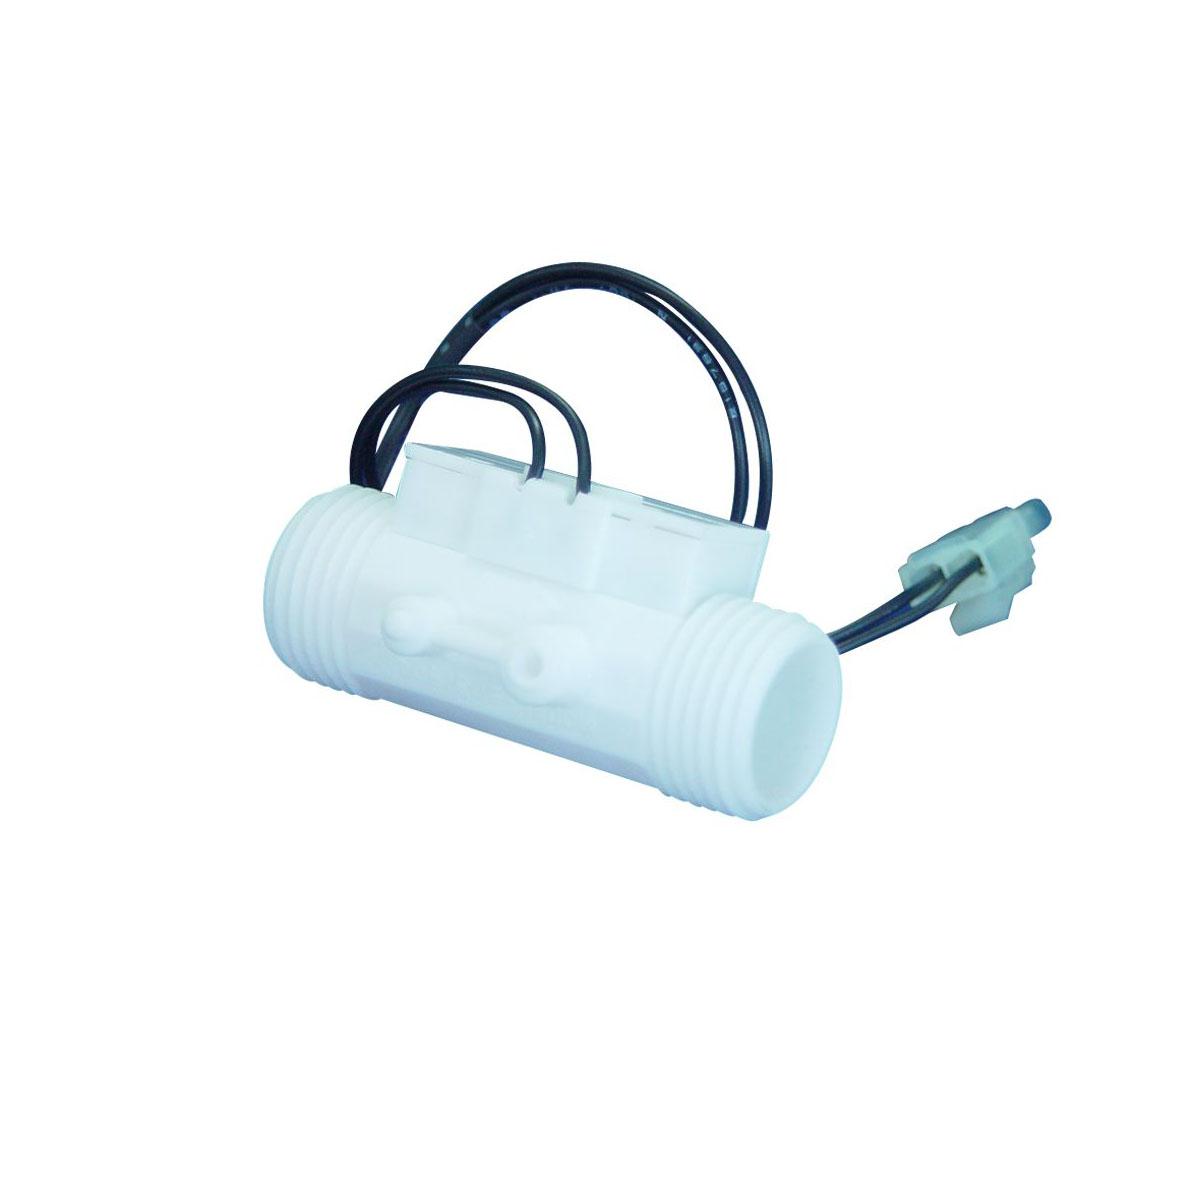 IMARI IM-J503 สวิทช์การไหล สำหรับงานน้ำและน้ำดื่ม